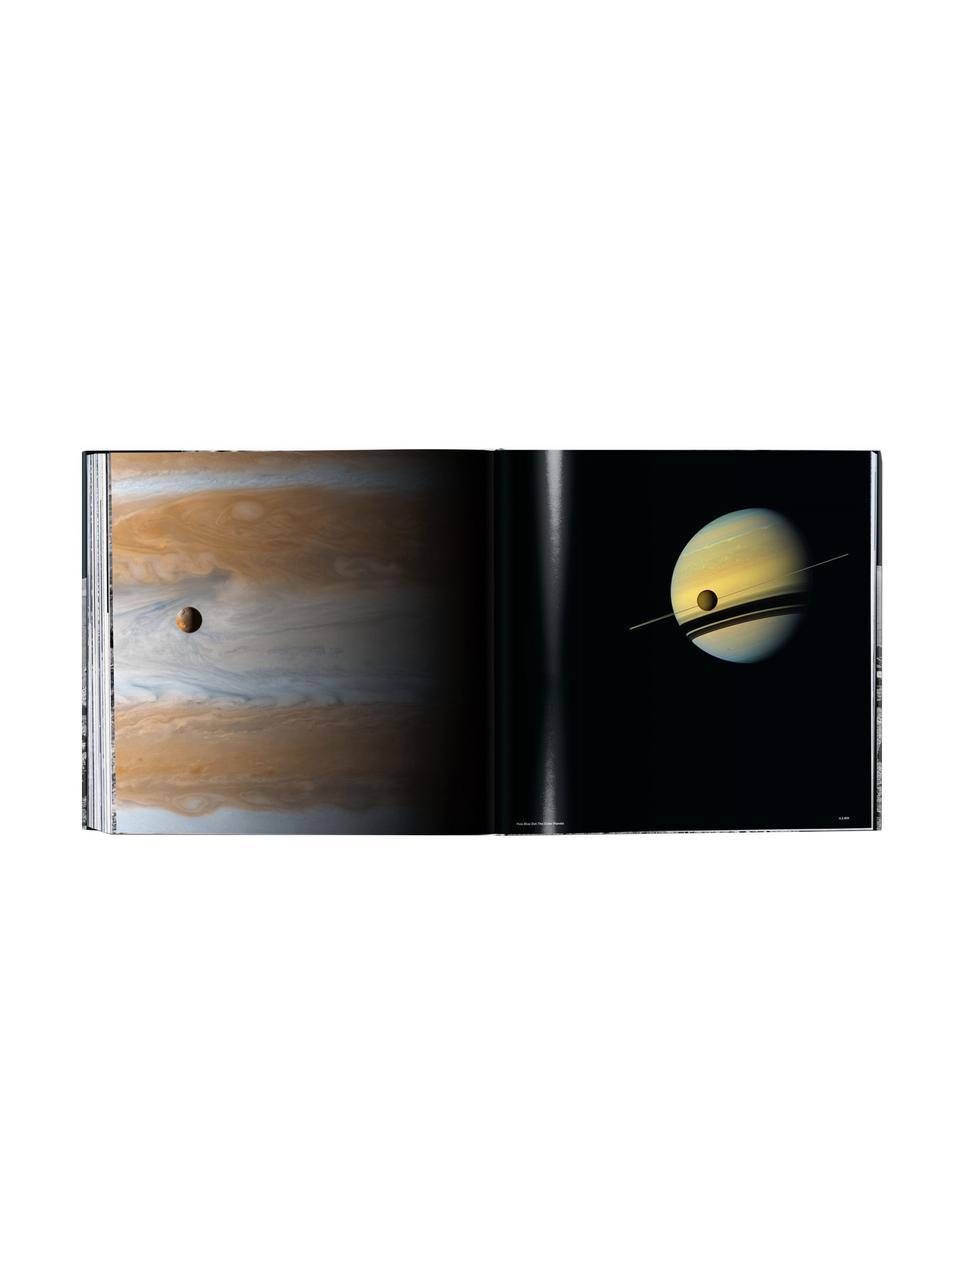 Bildband Das NASA Archiv. 60 Jahre im All, Hardcover, Papier, Mehrfarbig, 33 x 33 cm